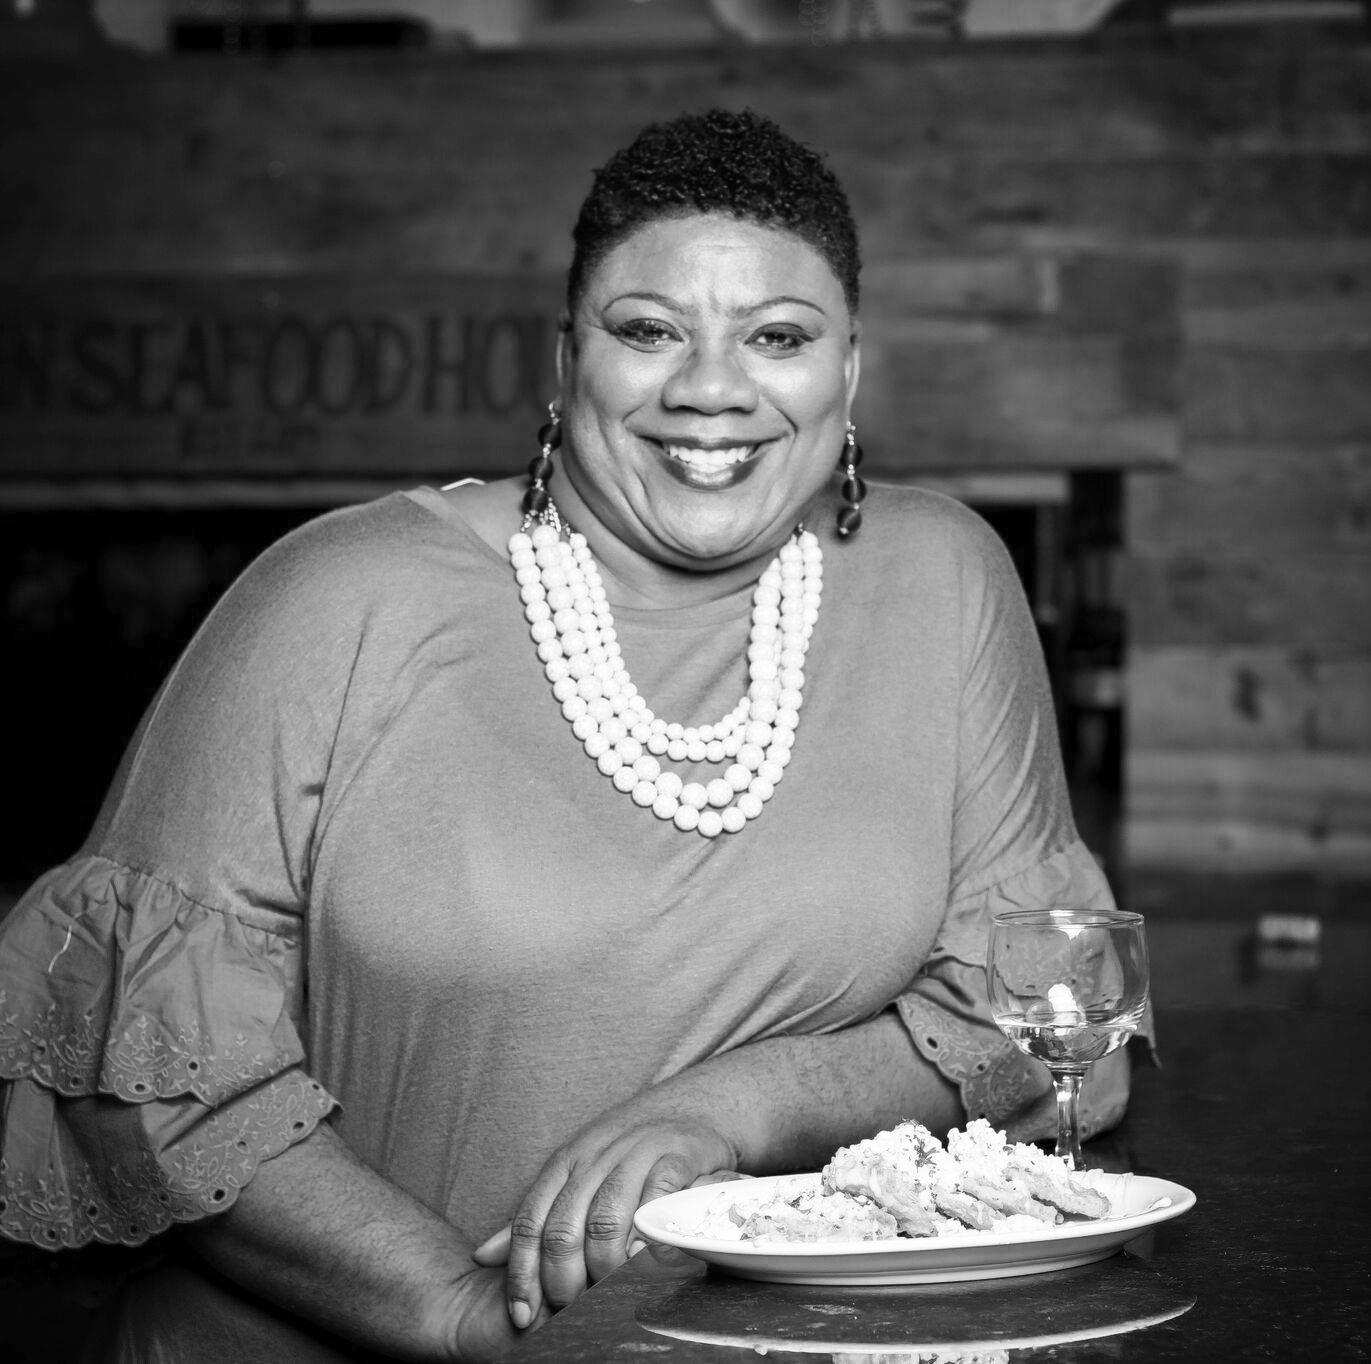 Comedienne Joy - Radio personality & entrepreneur